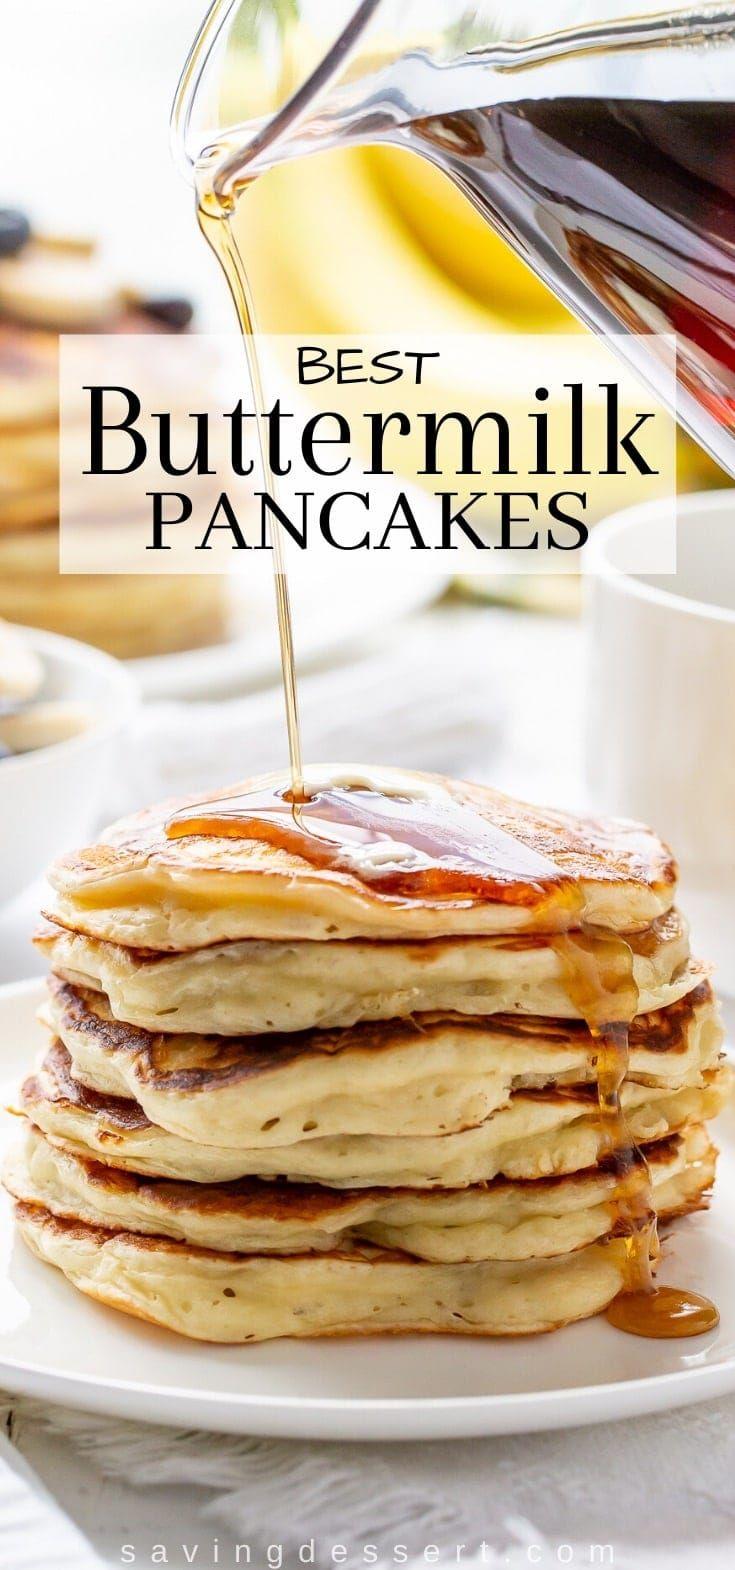 Best Buttermilk Pancakes Recipe In 2020 Buttermilk Pancakes Pancakes Recipes